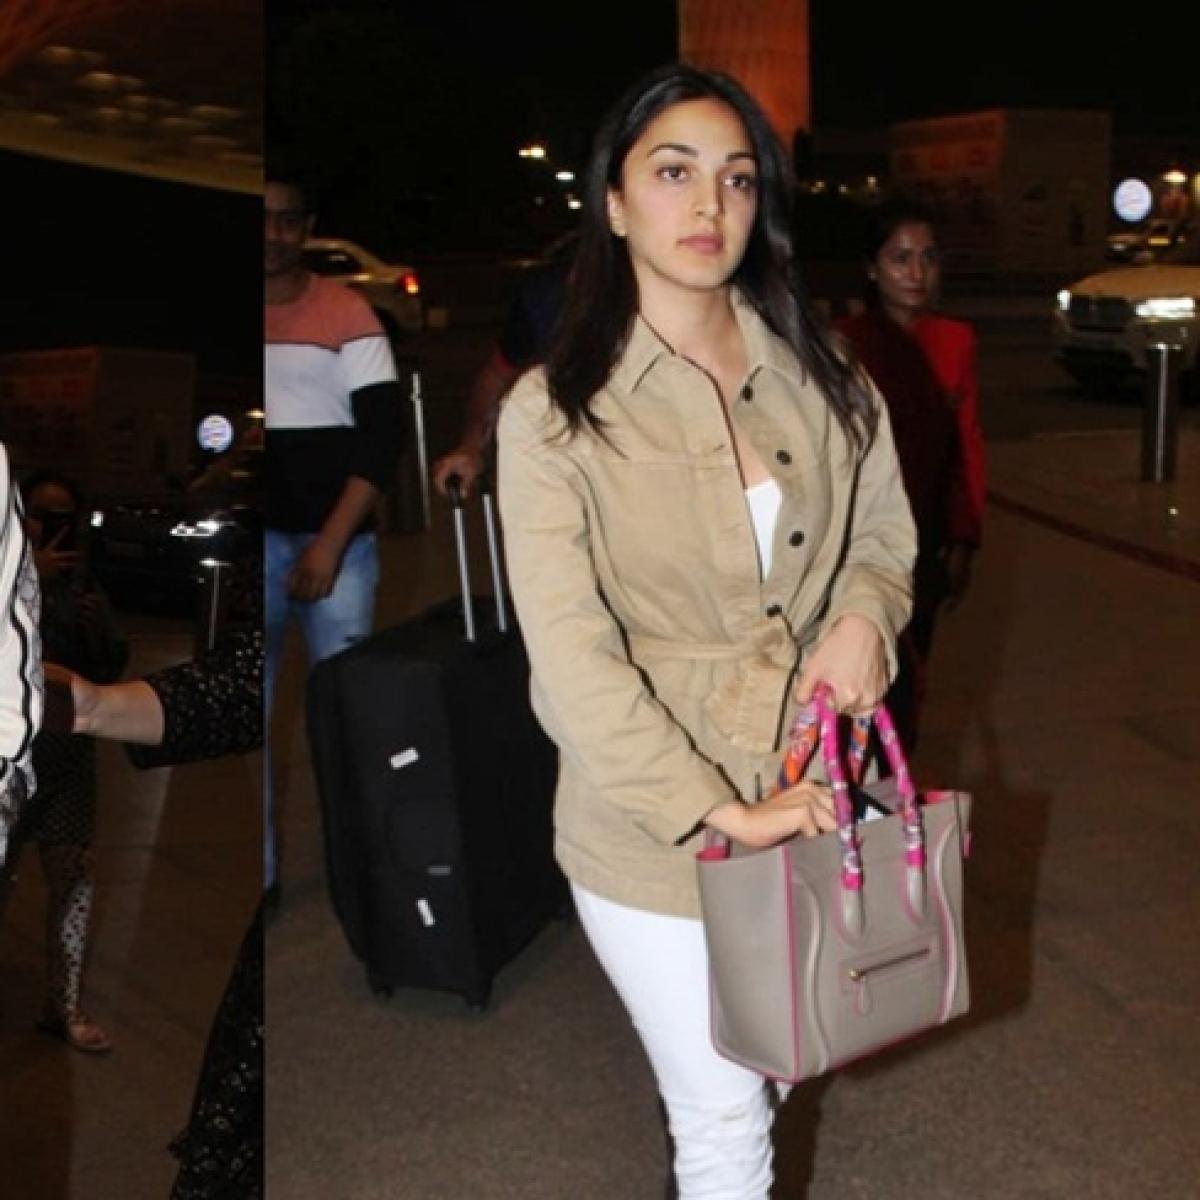 Sidharth Malhotra, Kiara Advani caught leaving for romantic vacay